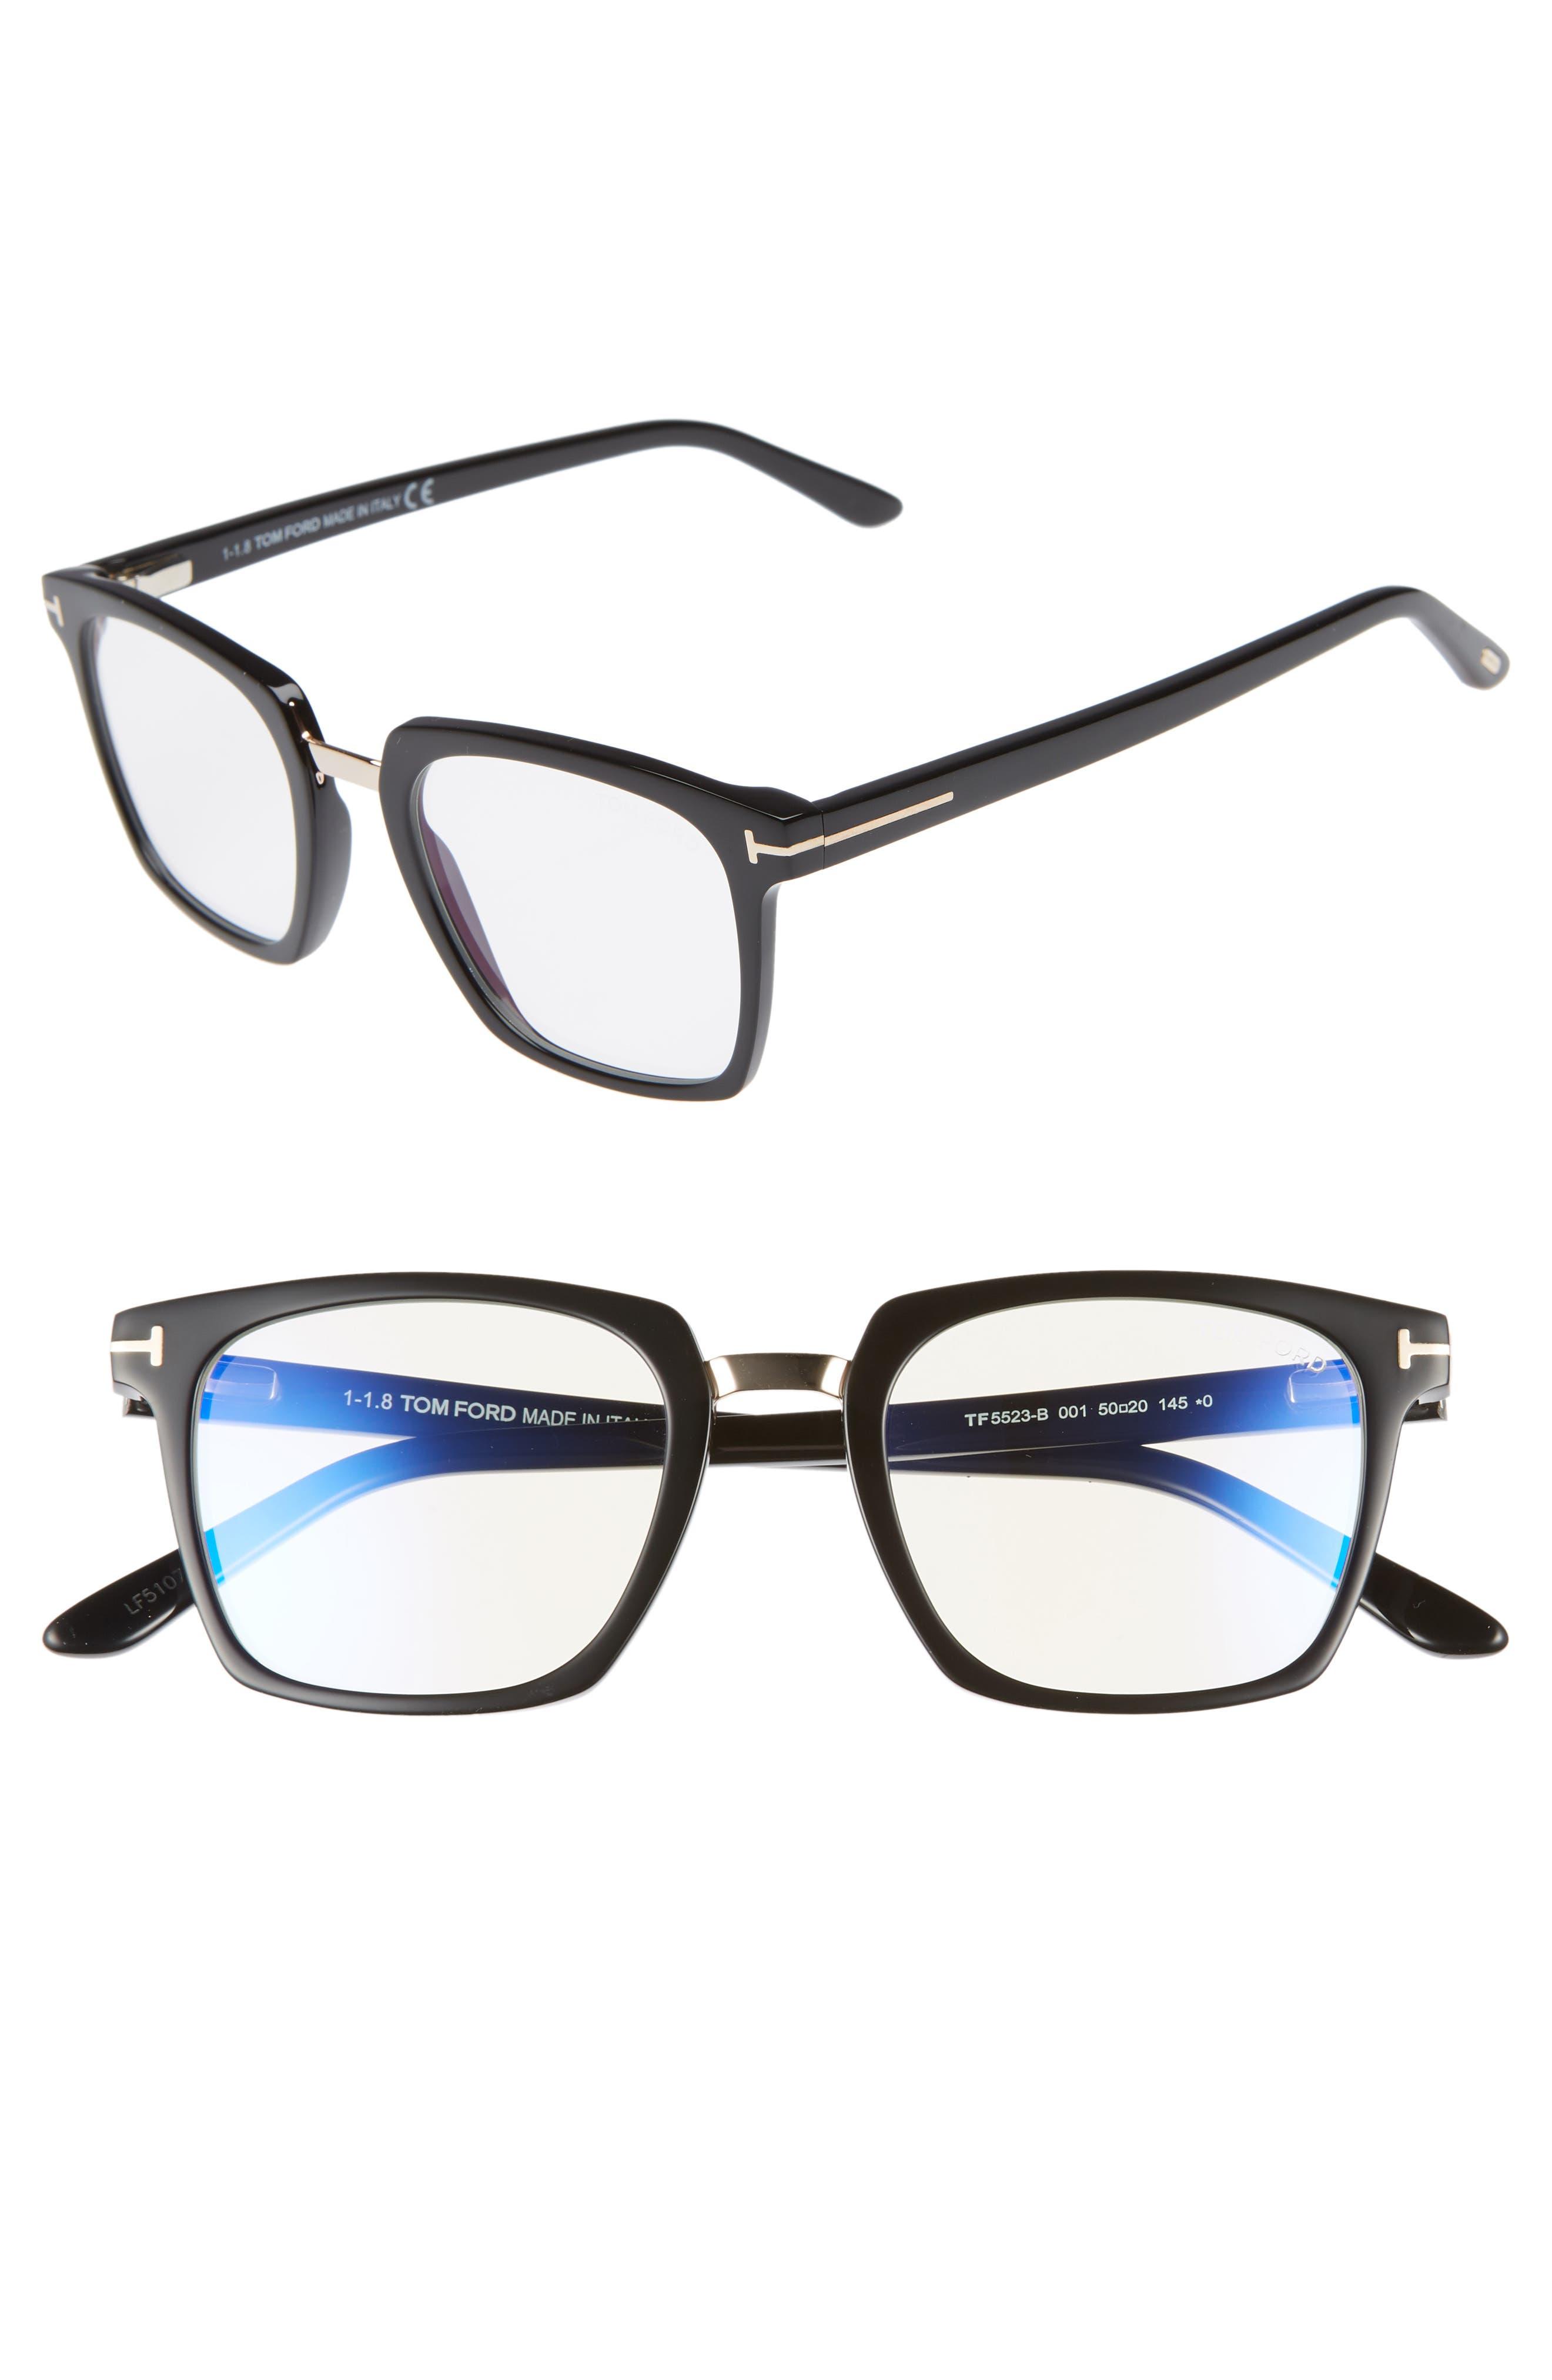 5f48c8df892 Tom Ford Optical Frames   Reading Glasses